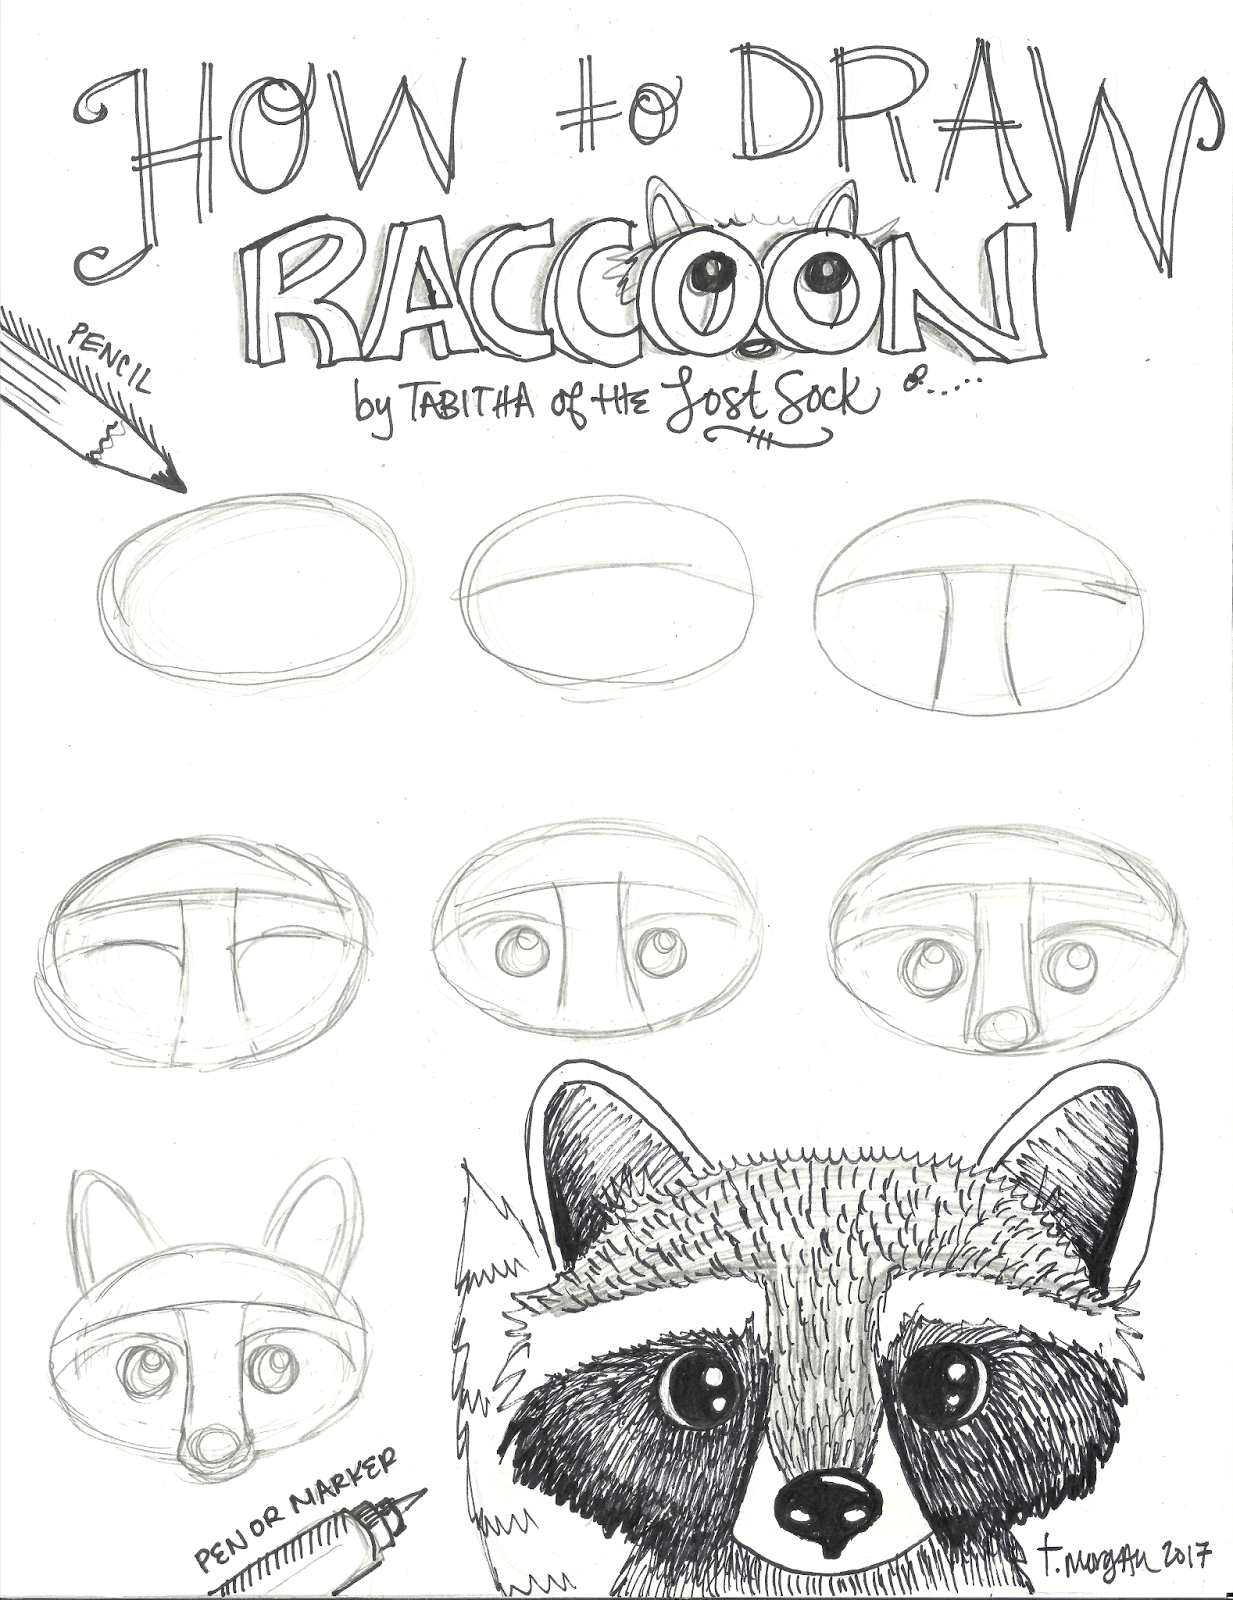 The Lost Sock : Fall Raccoon